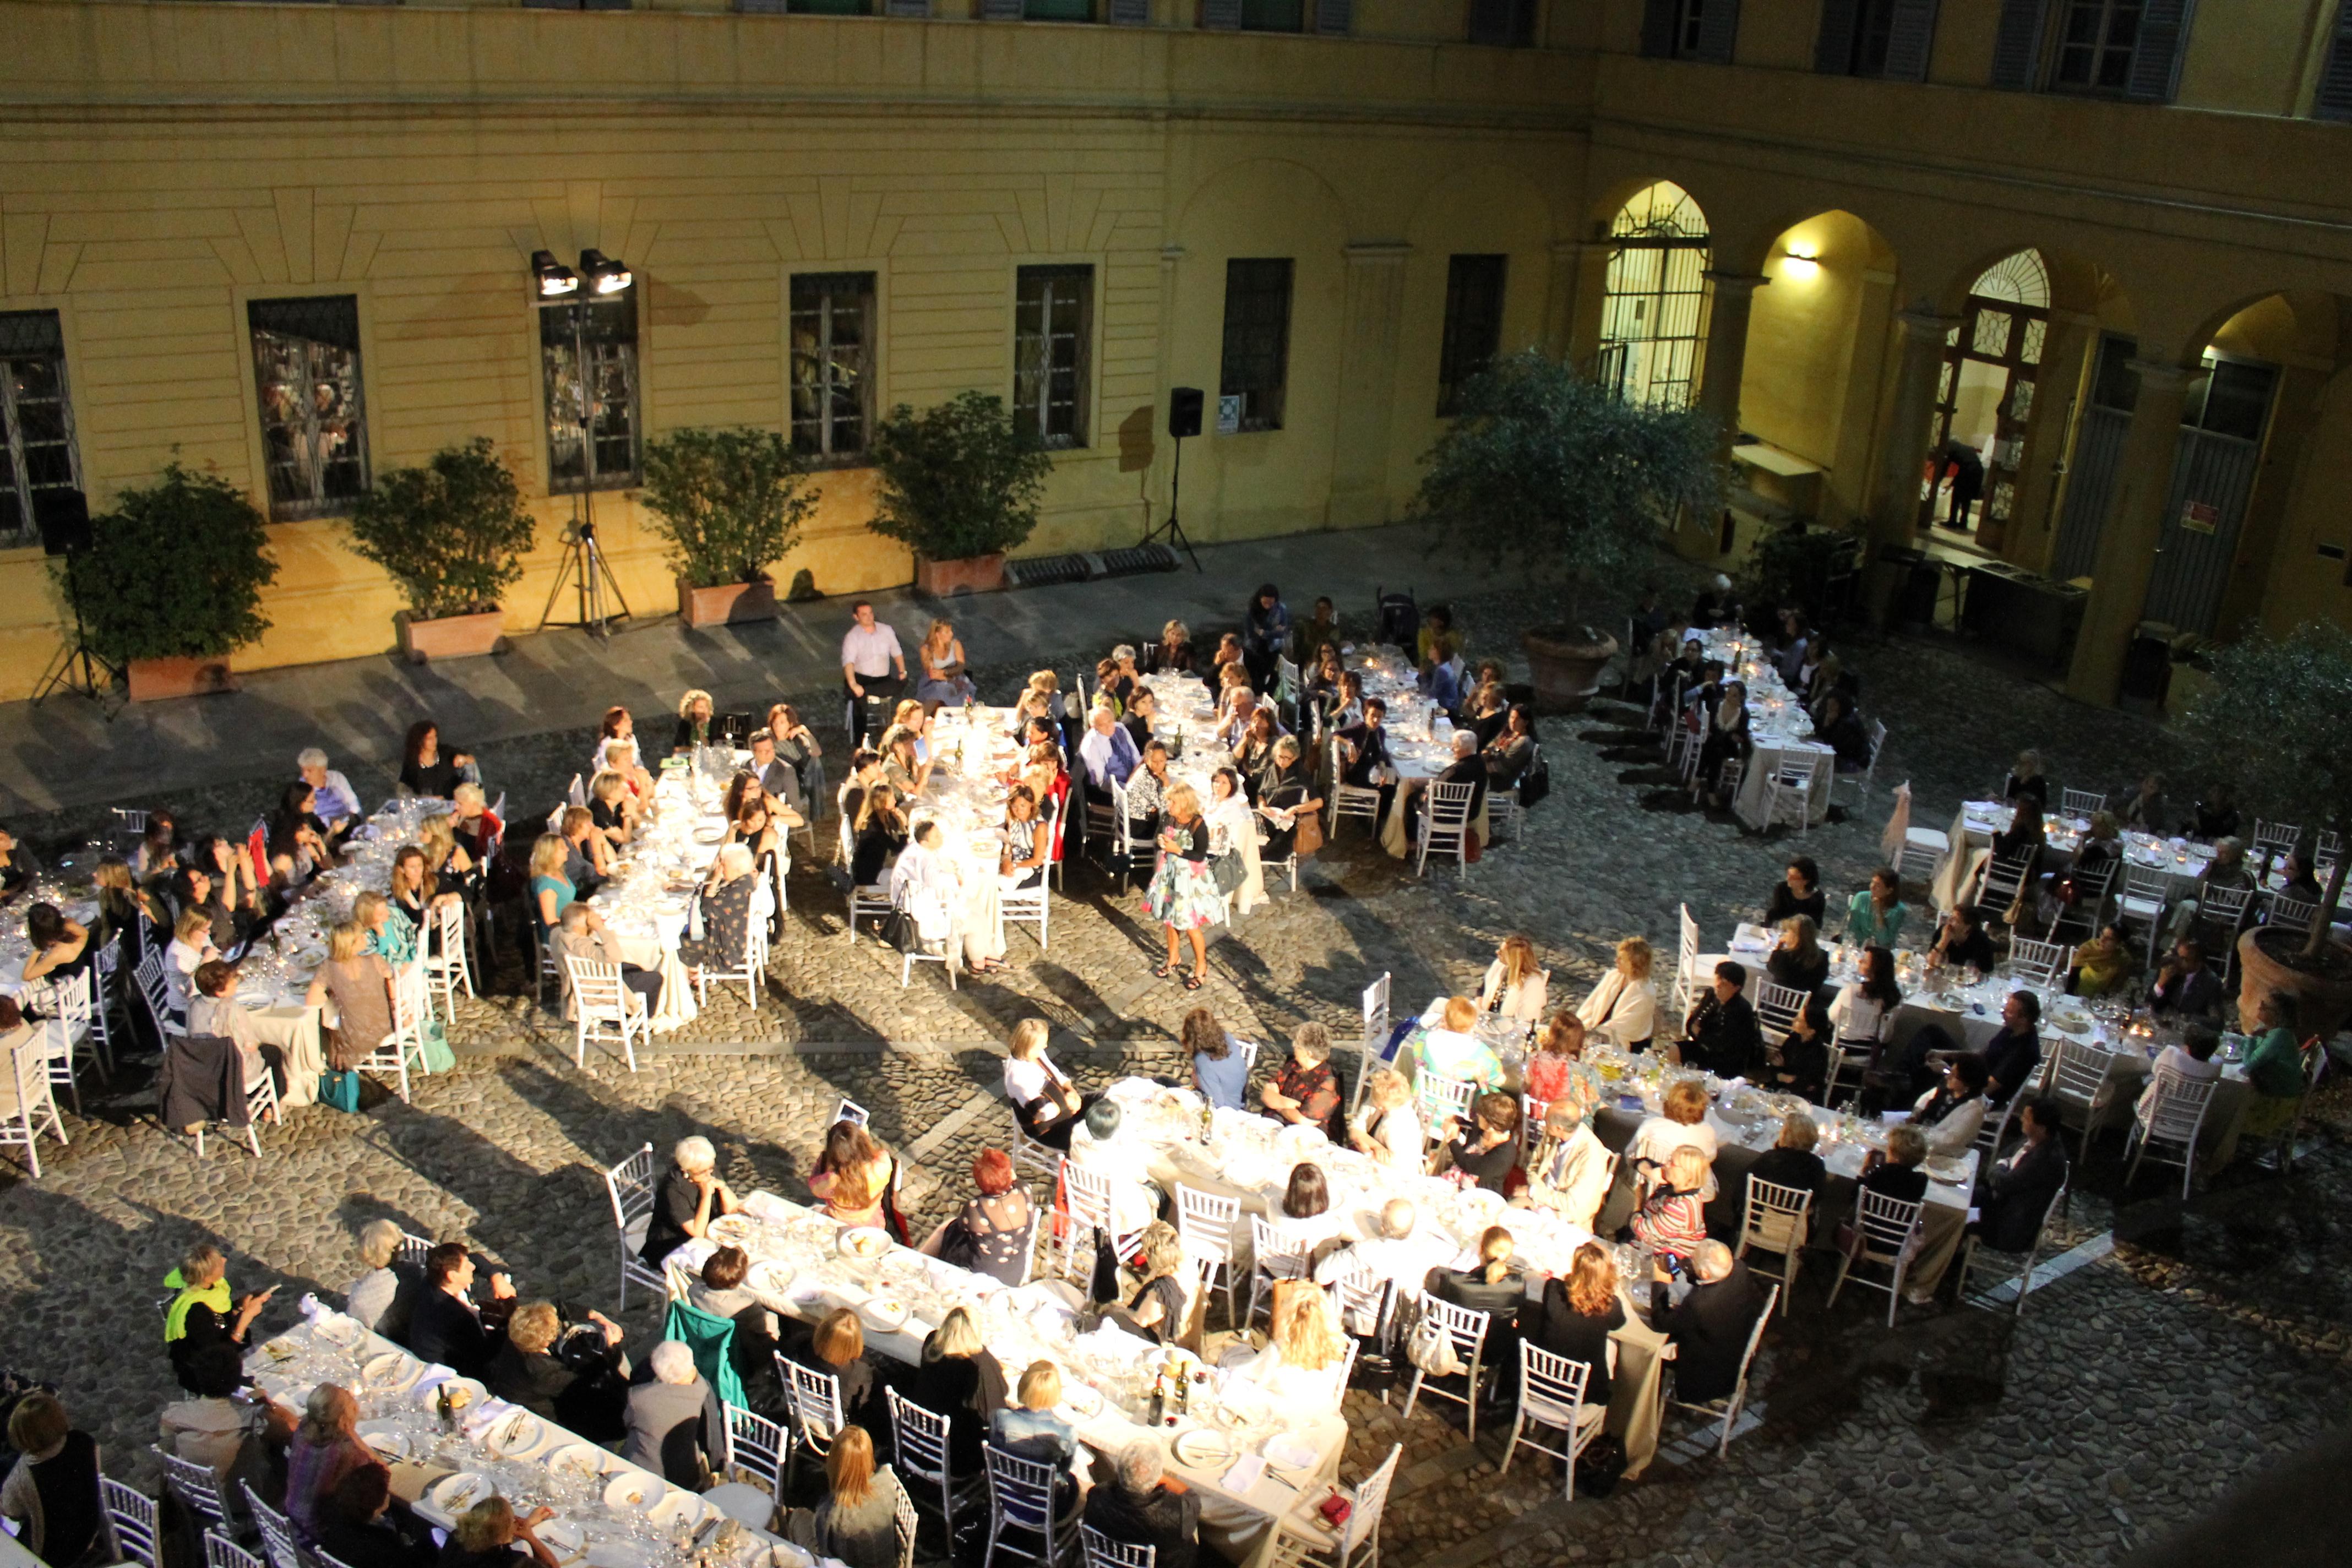 02-palazzo provincia cena 2014